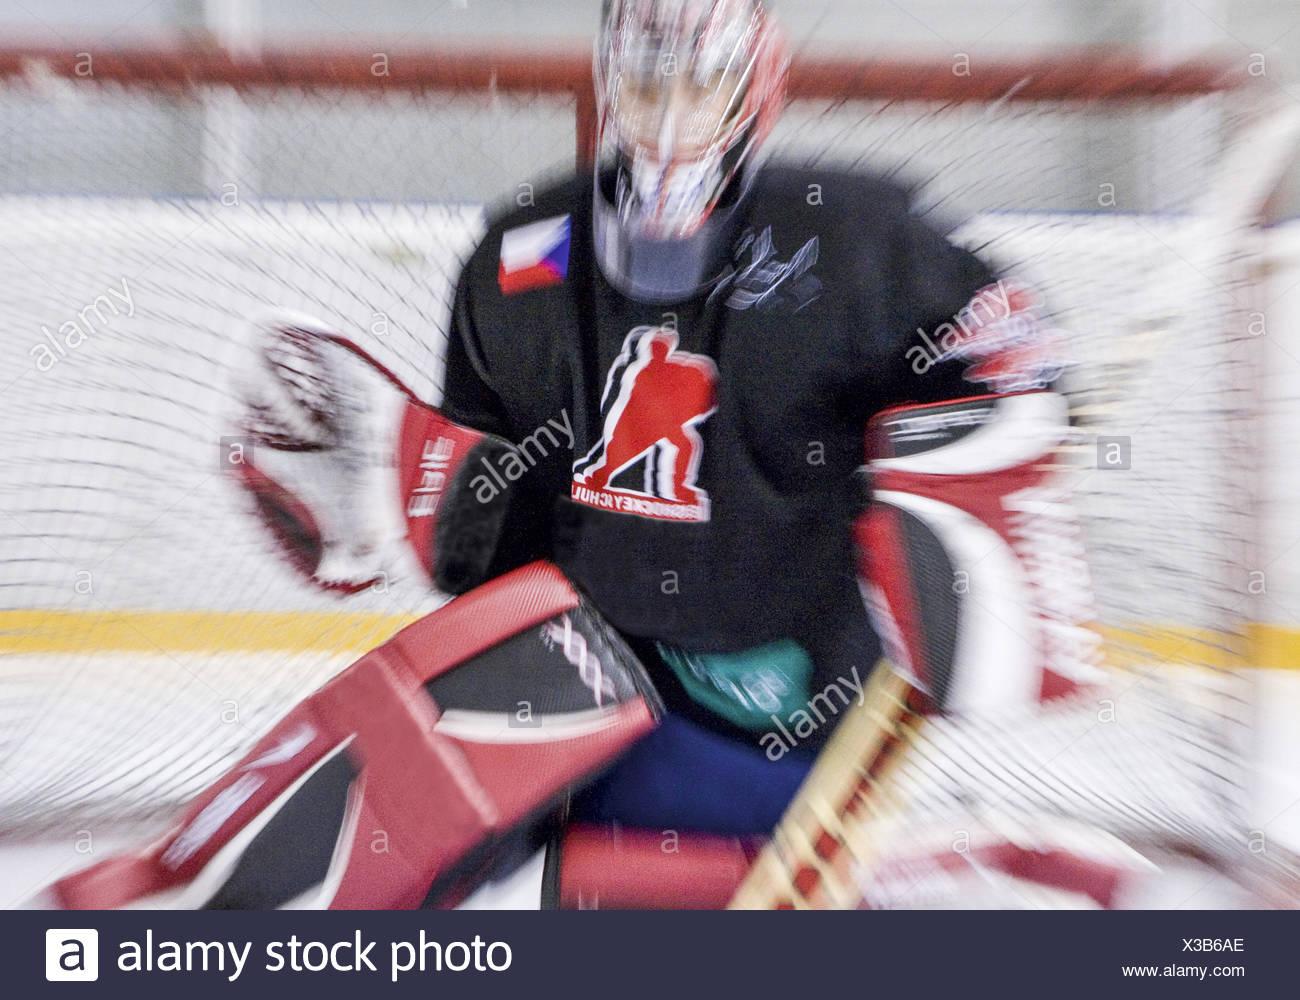 Eishockey, Torhueter, Zoomeffekt (model-released) - Stock Image